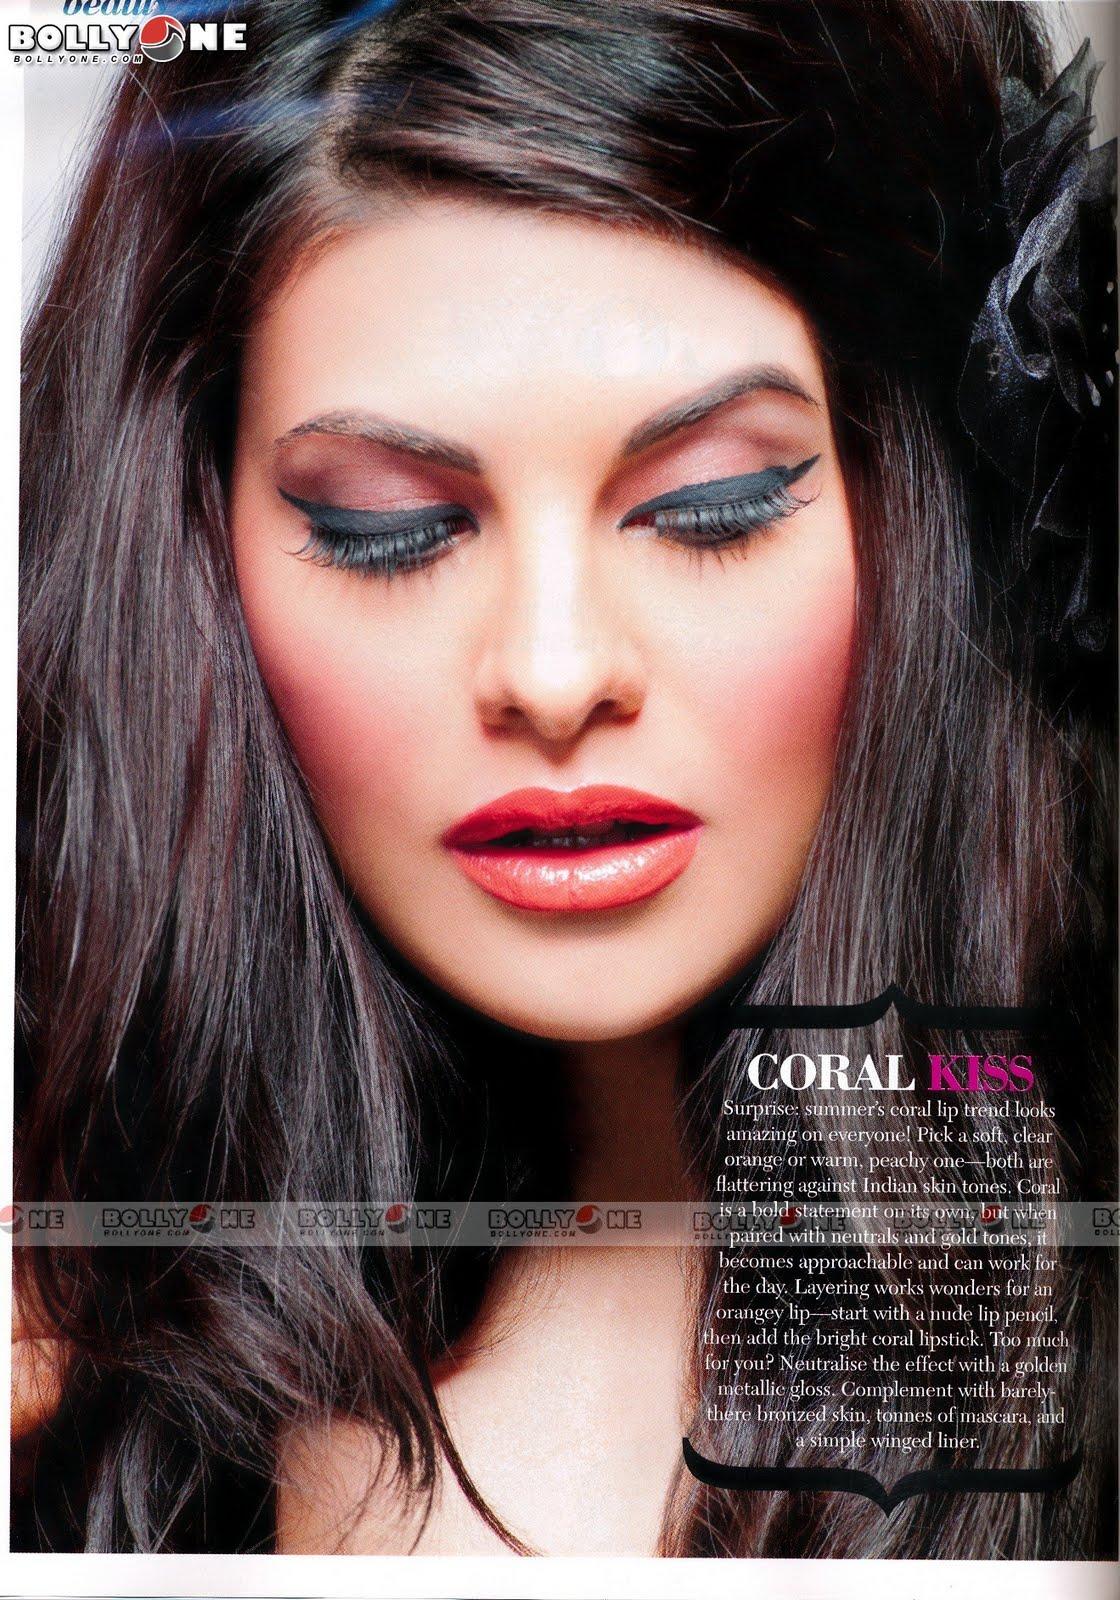 , Jacqueline Fernandez COSMOPOLITAN Magazine May 2011 HQ Pictures